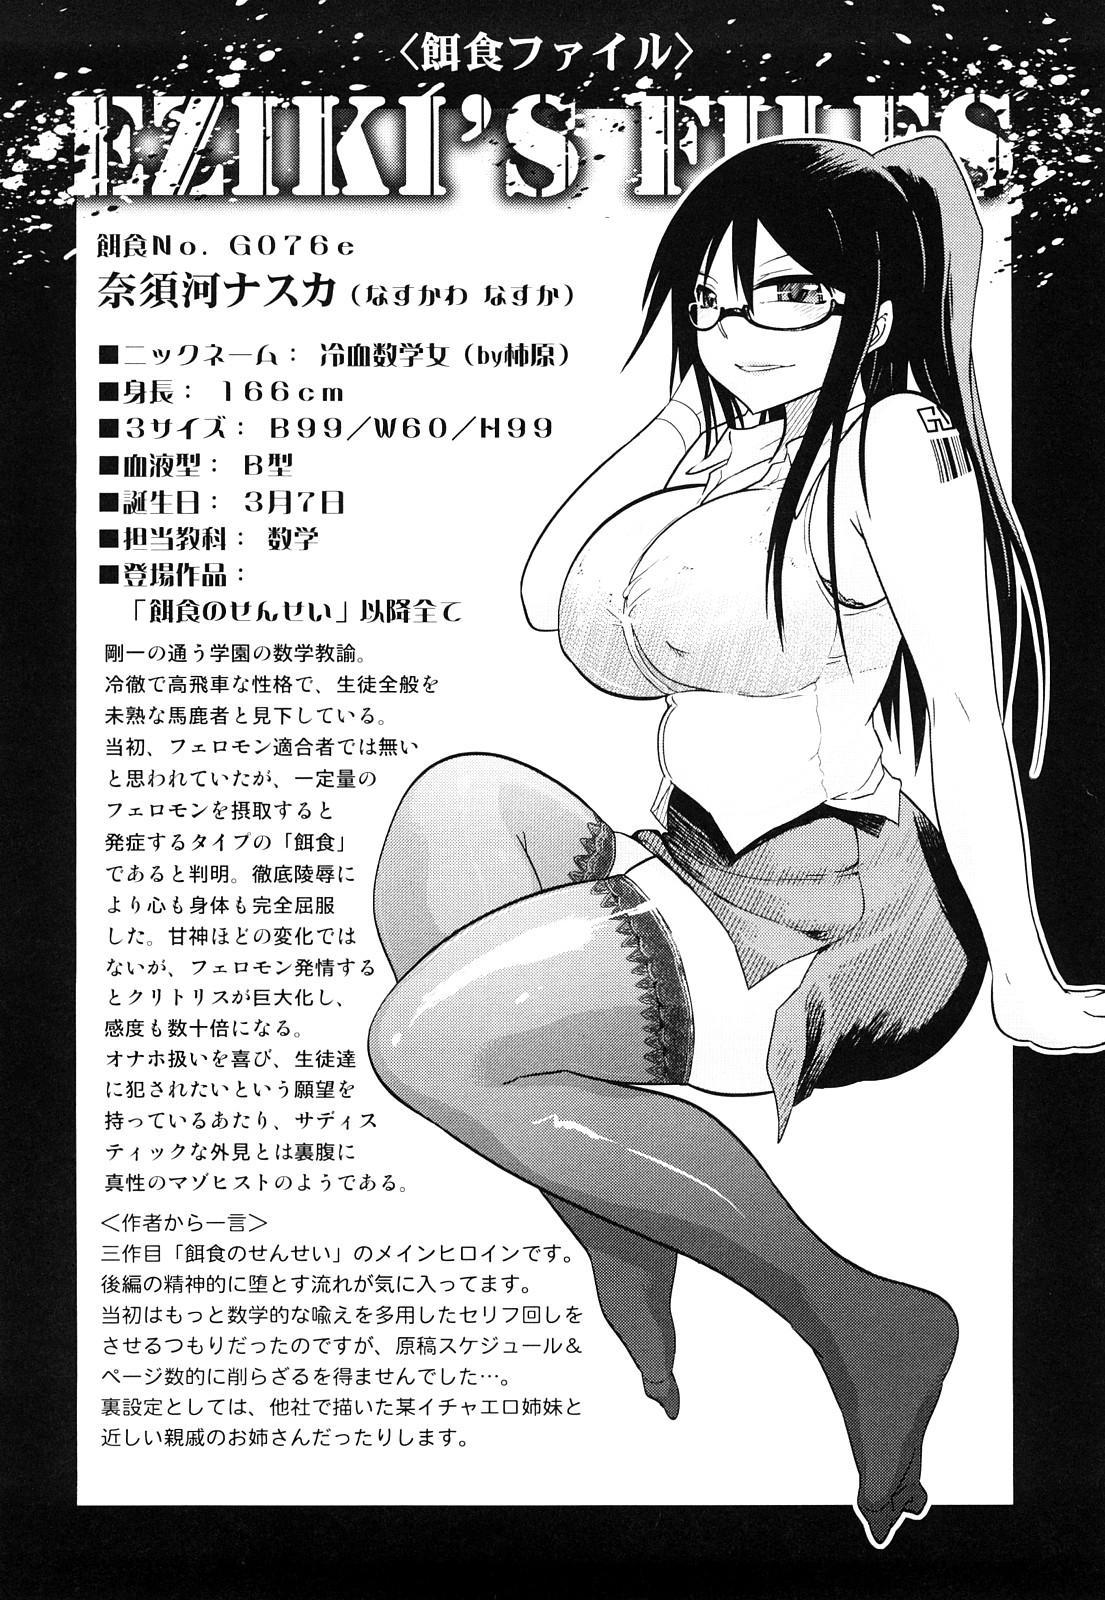 Seifuku Mesubuta Chitai - The Nymphomaniac Zone 74